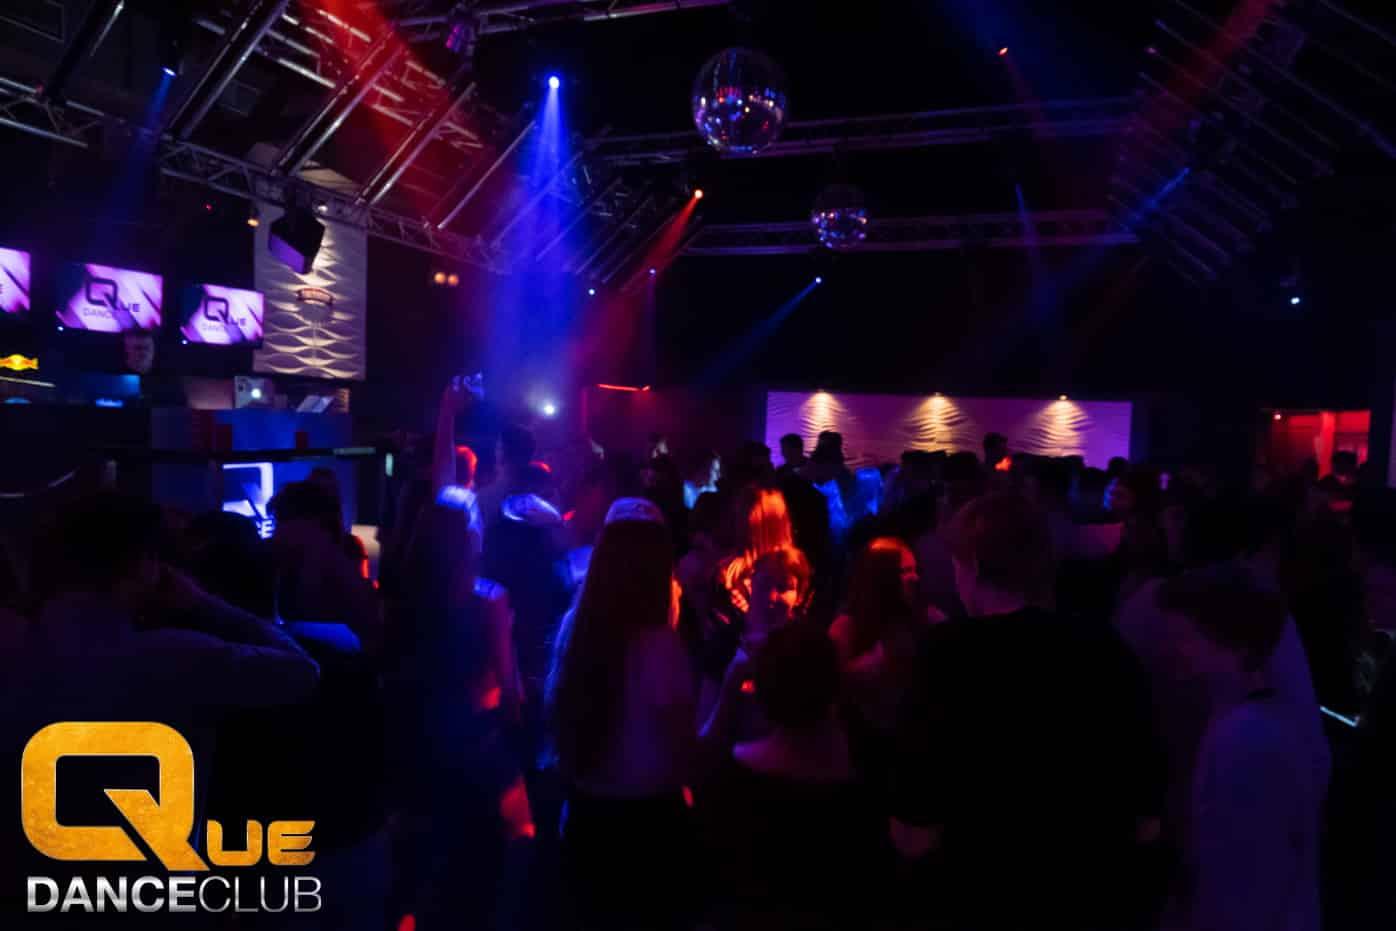 2018_12_20_Que_Danceclub_XMAS_Abiparty_United_Nightlife_Scene_Timo_023